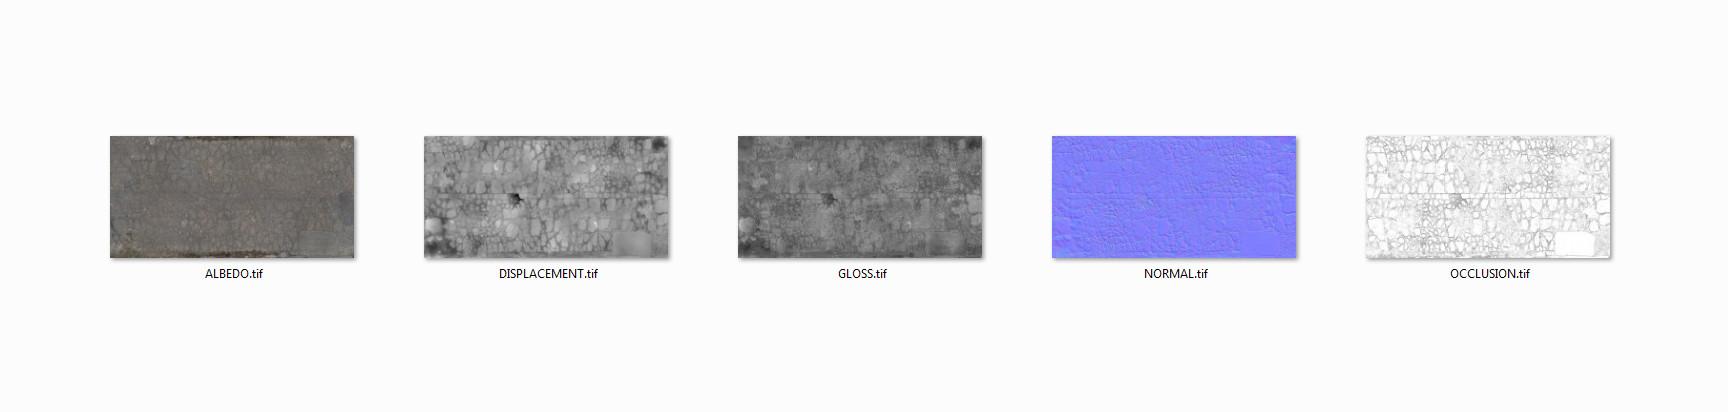 https://cdna.artstation.com/p/assets/images/images/007/233/340/large/sebastian-zapata-preview.jpg?1504648963